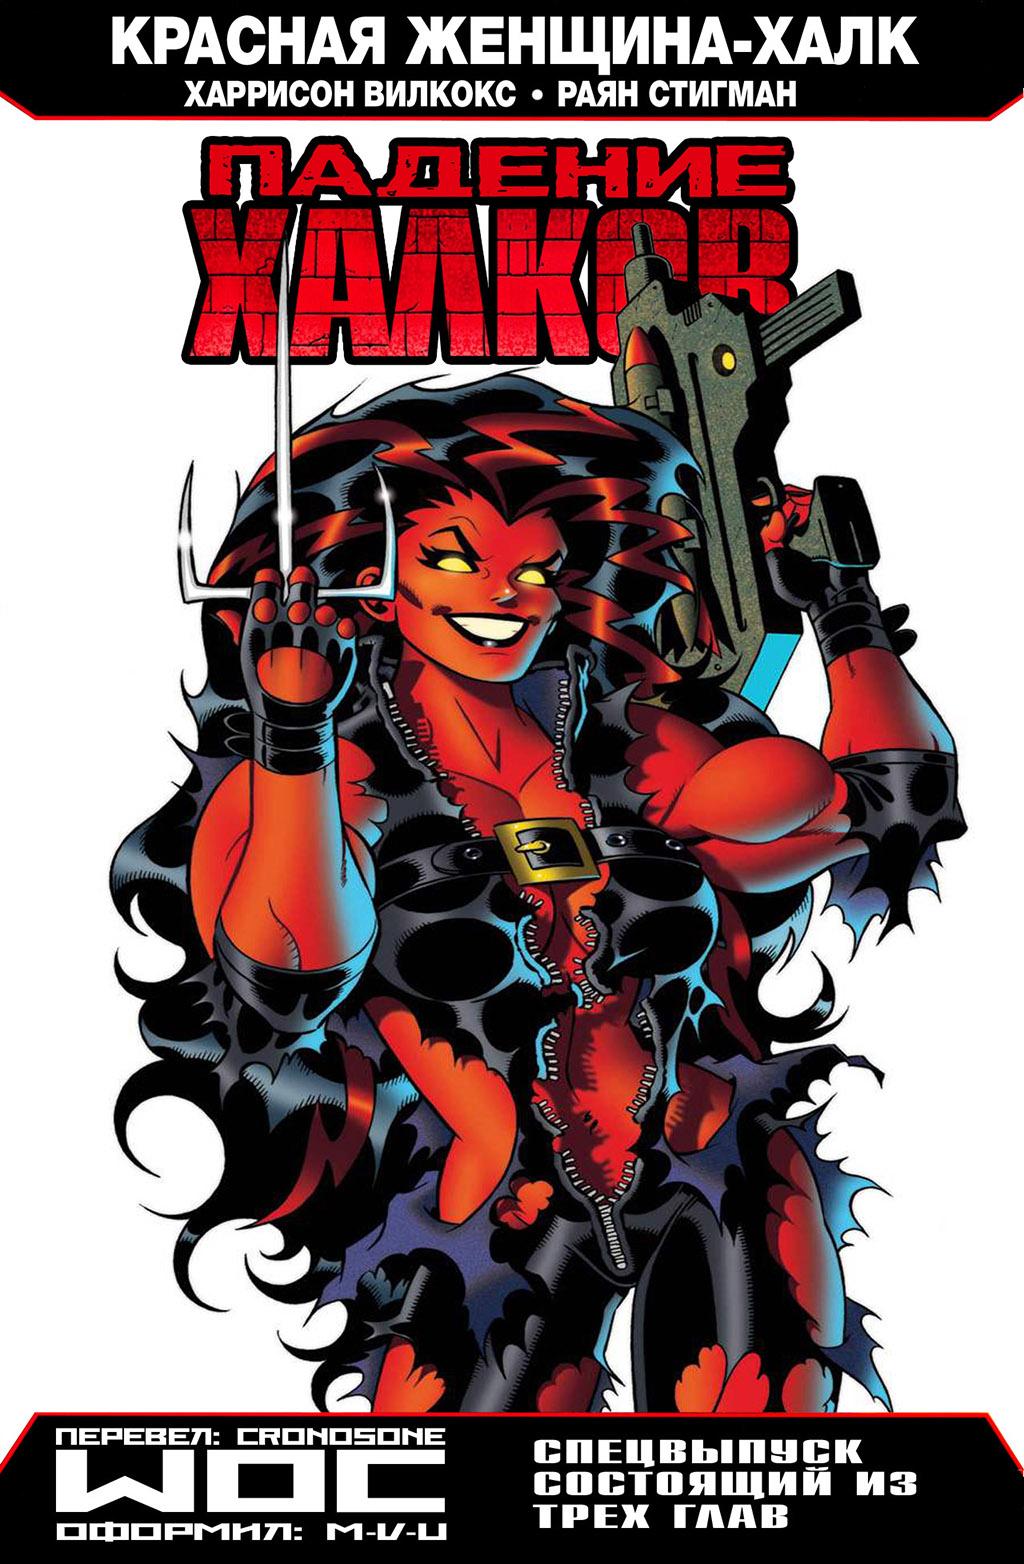 Комикс Красная Женщина-Халк